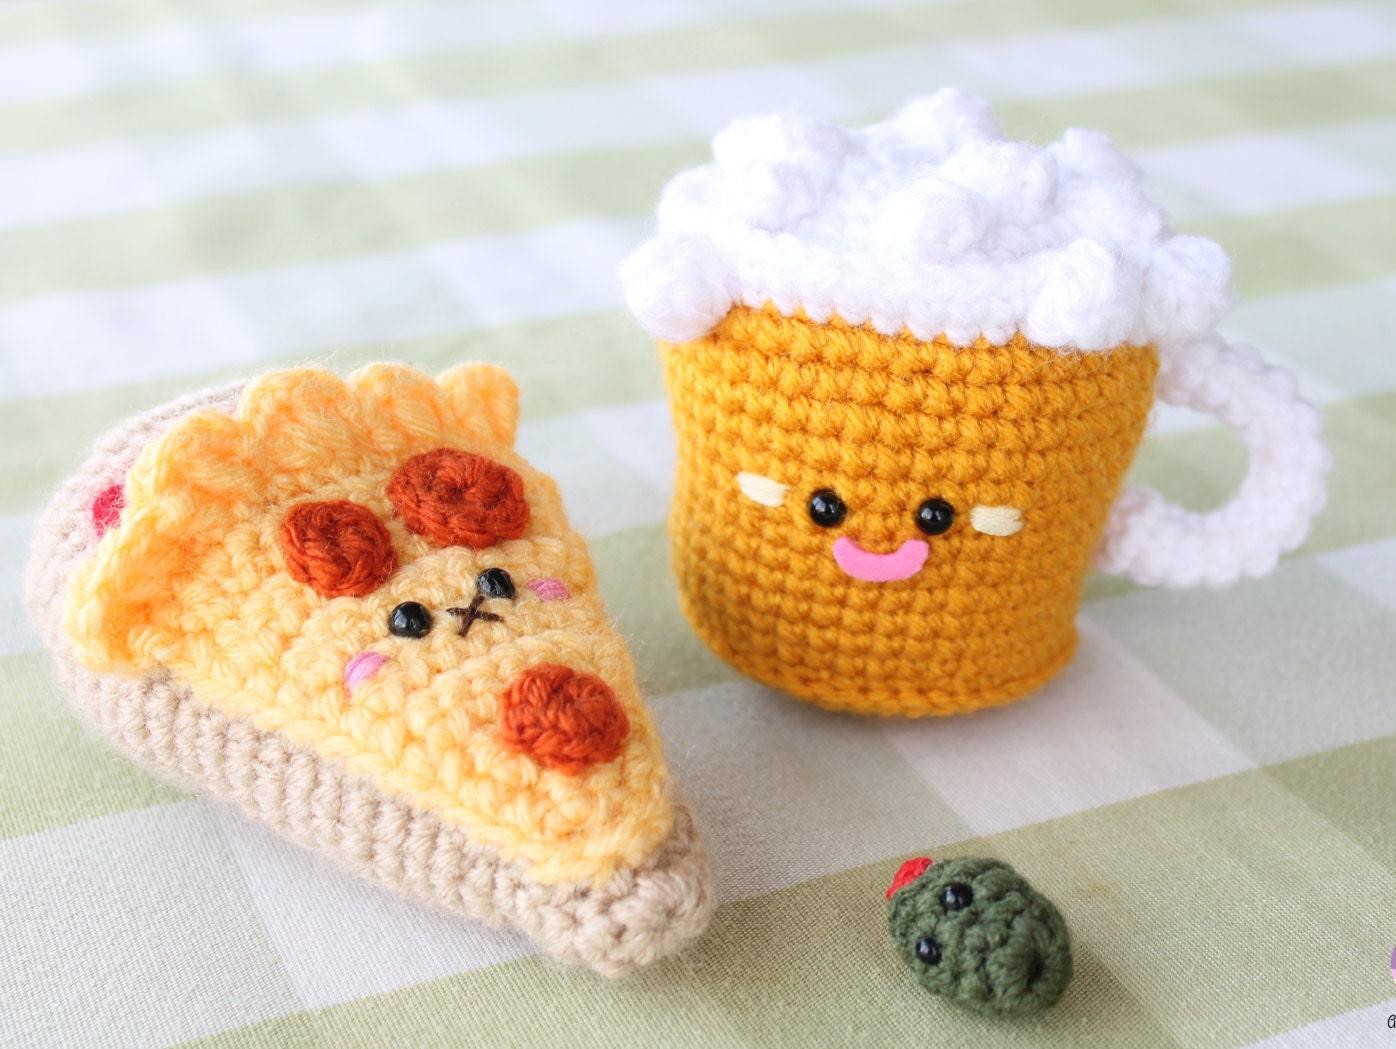 Amigurumi Crochet Food Patterns : Amigurumi Food Combo Pizza Night Beer Crochet Pattern